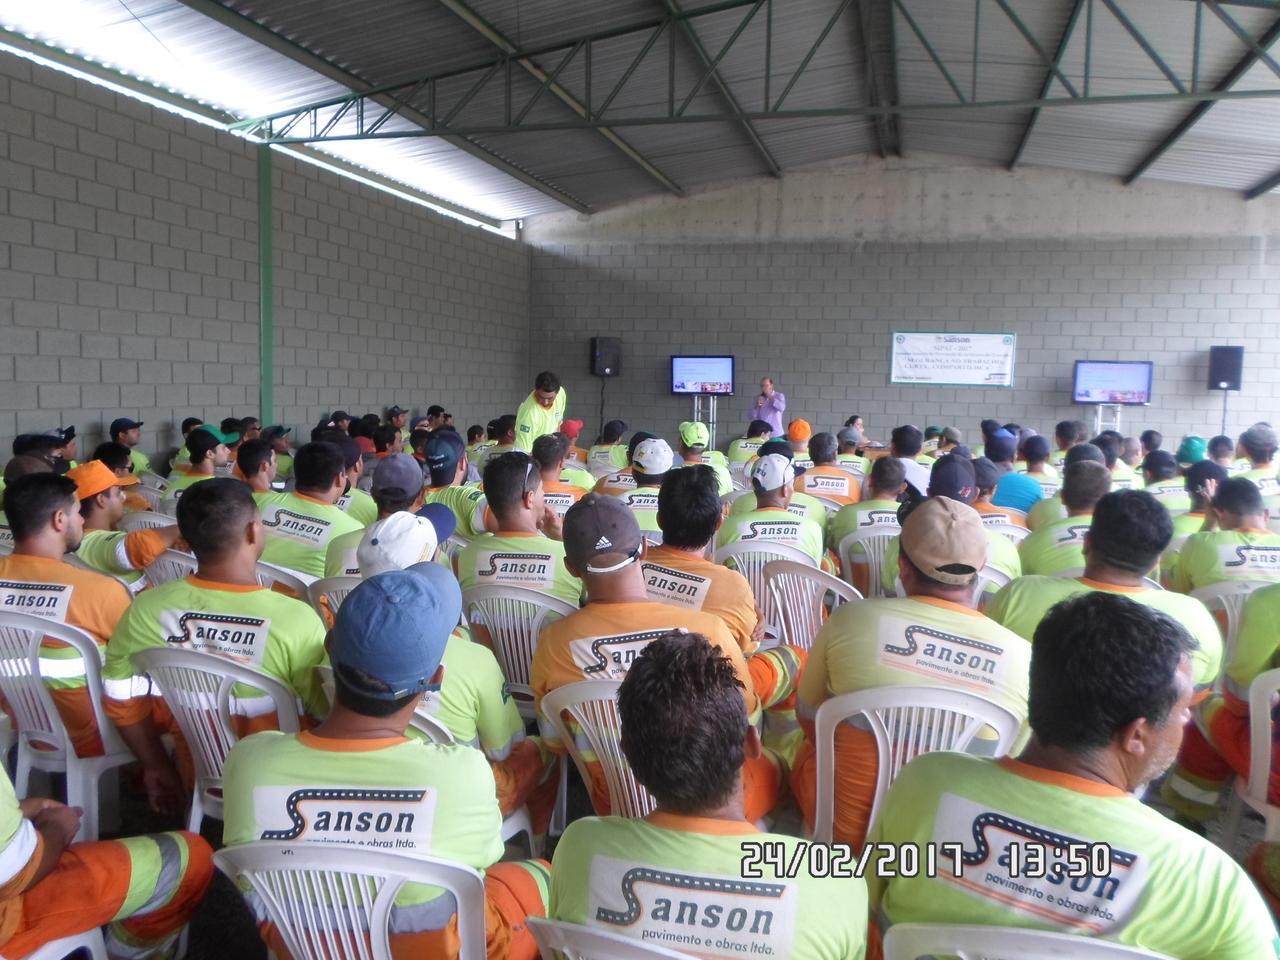 SIPAT - Sanson Pavimento e Obras - Evento Grupo Sanson